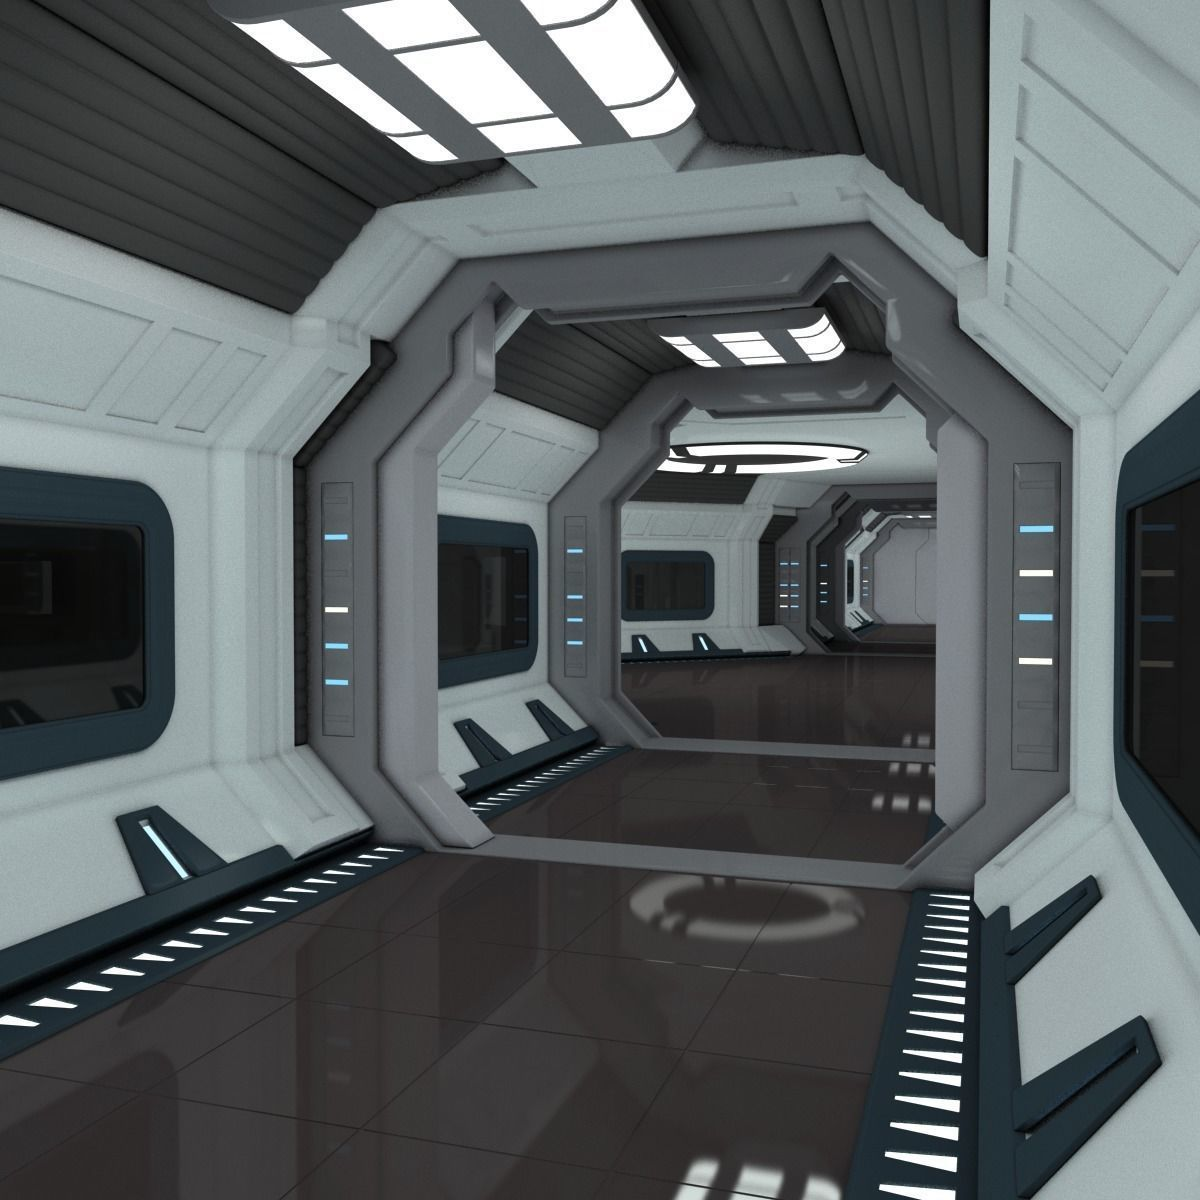 Modular Spaceship Interior 3d Model 2020 サイバーパンク